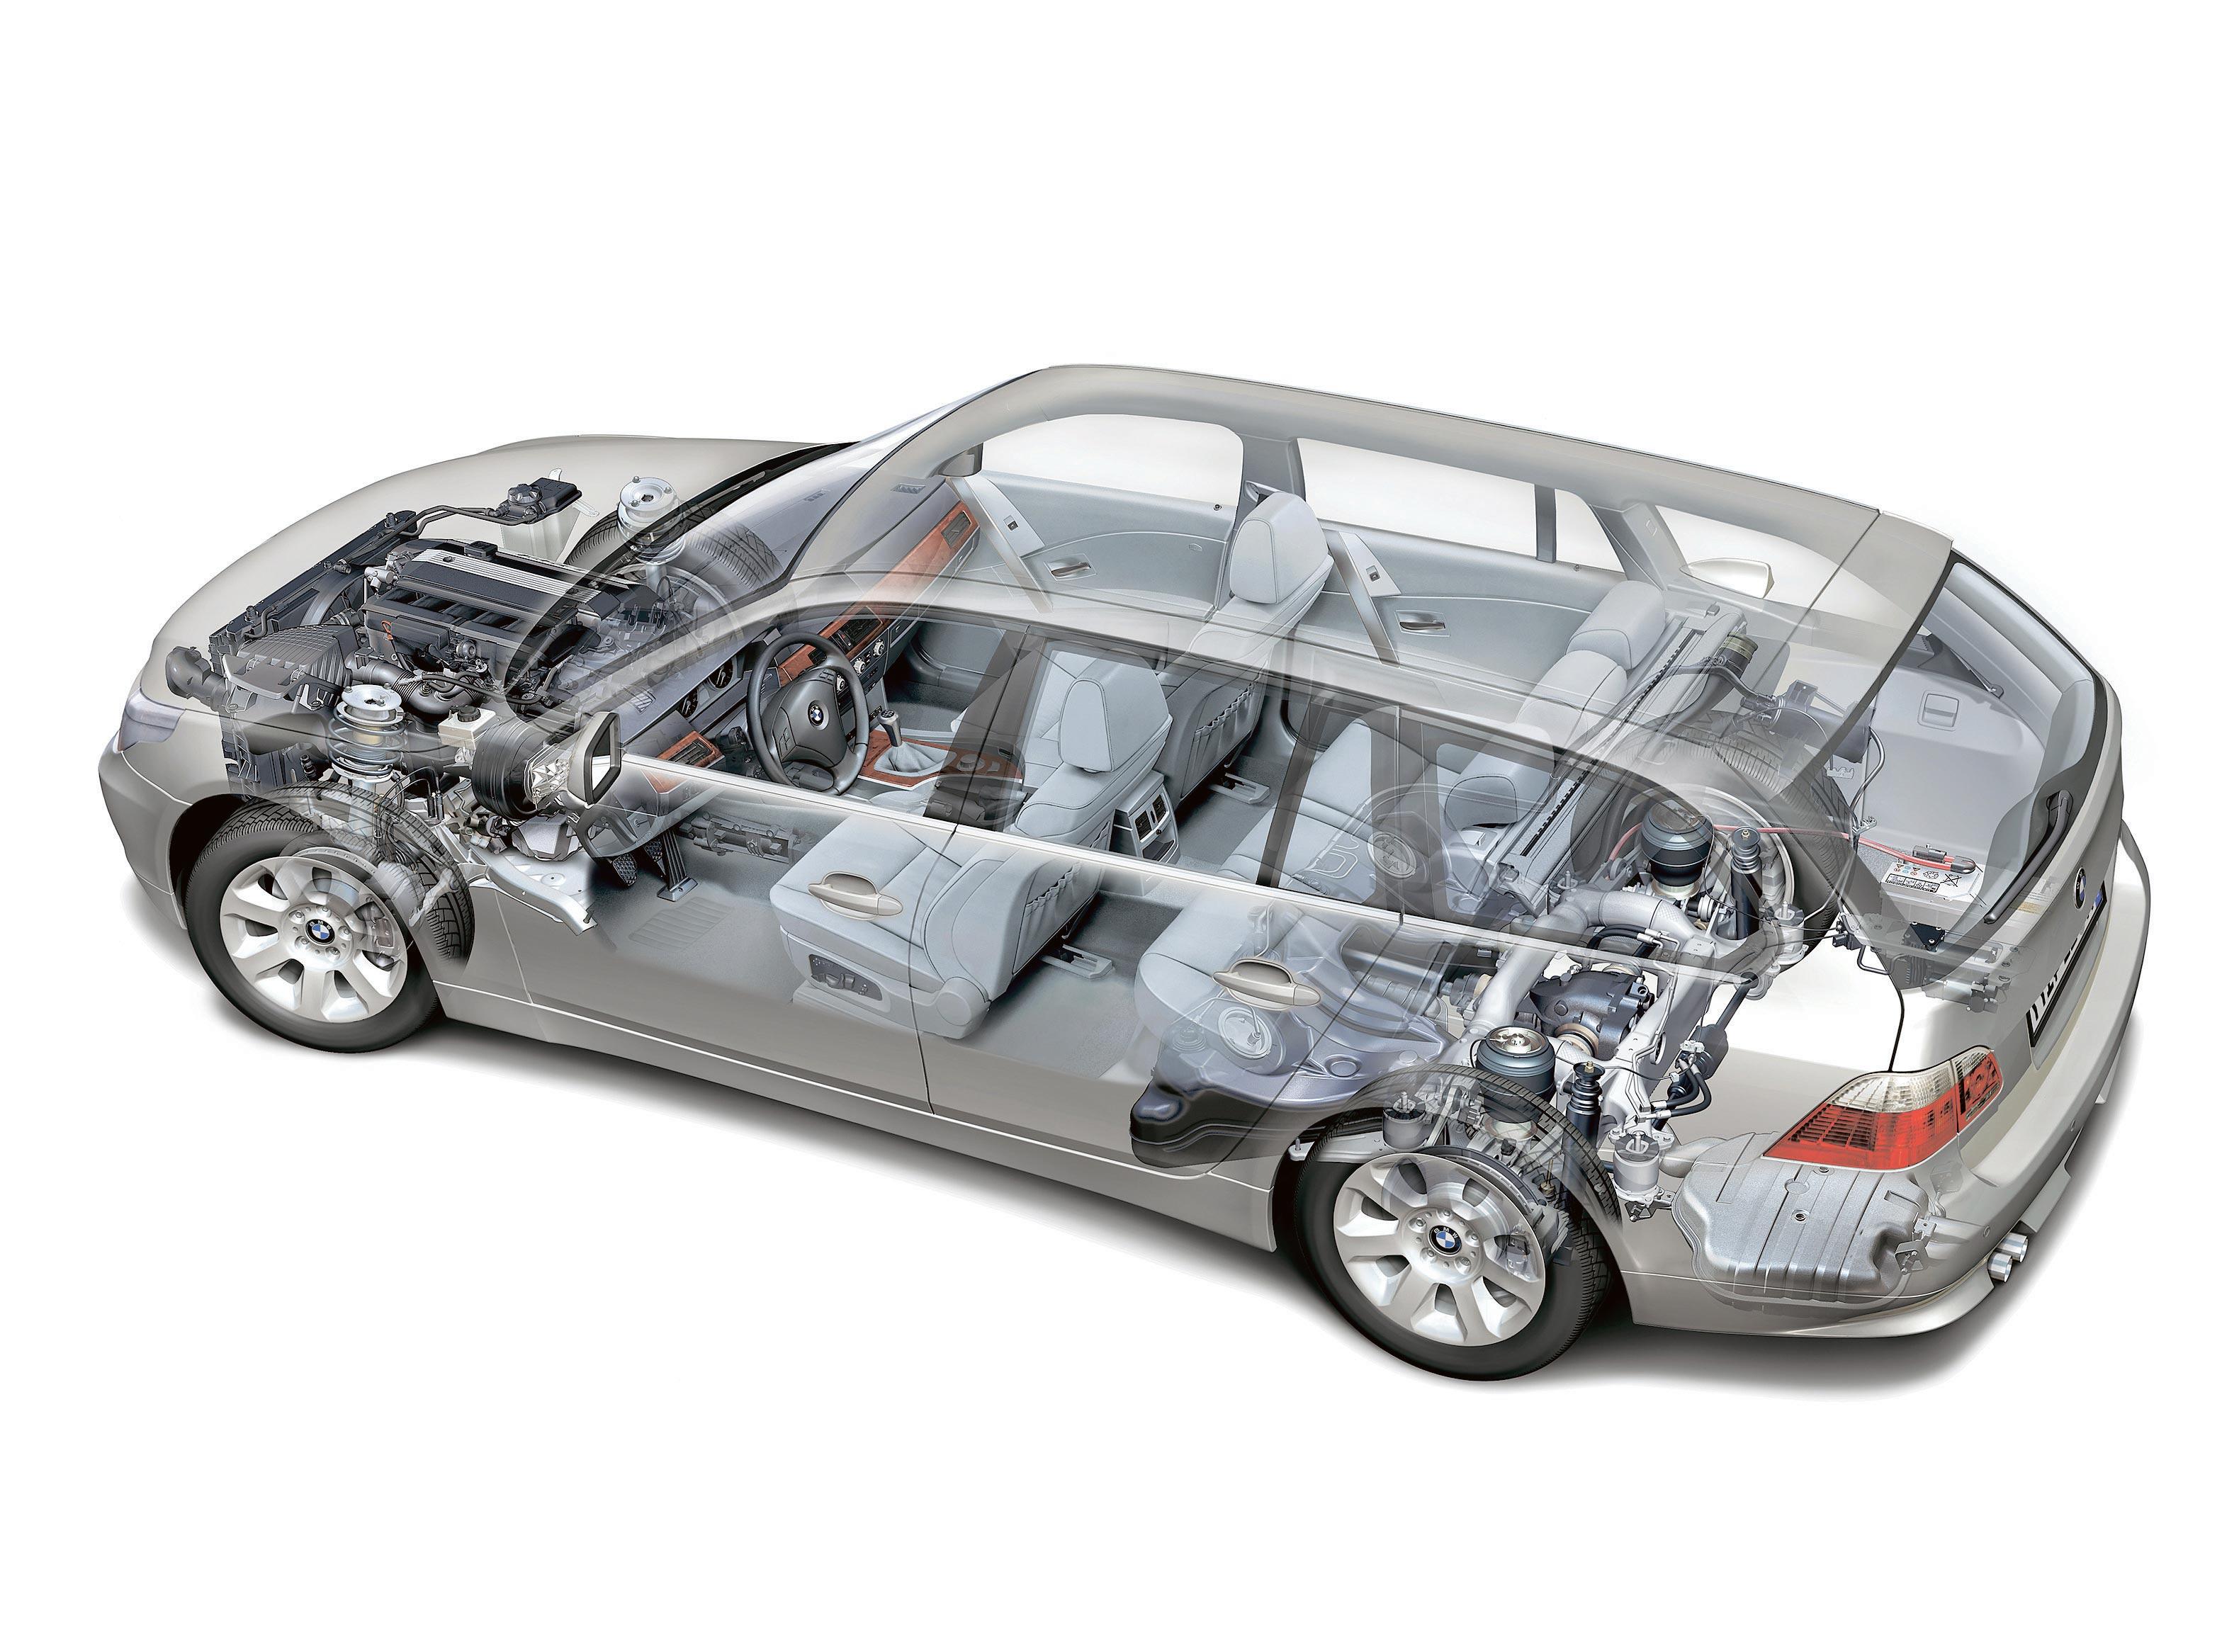 BMW 5 Series Touring E61 cutaway drawing